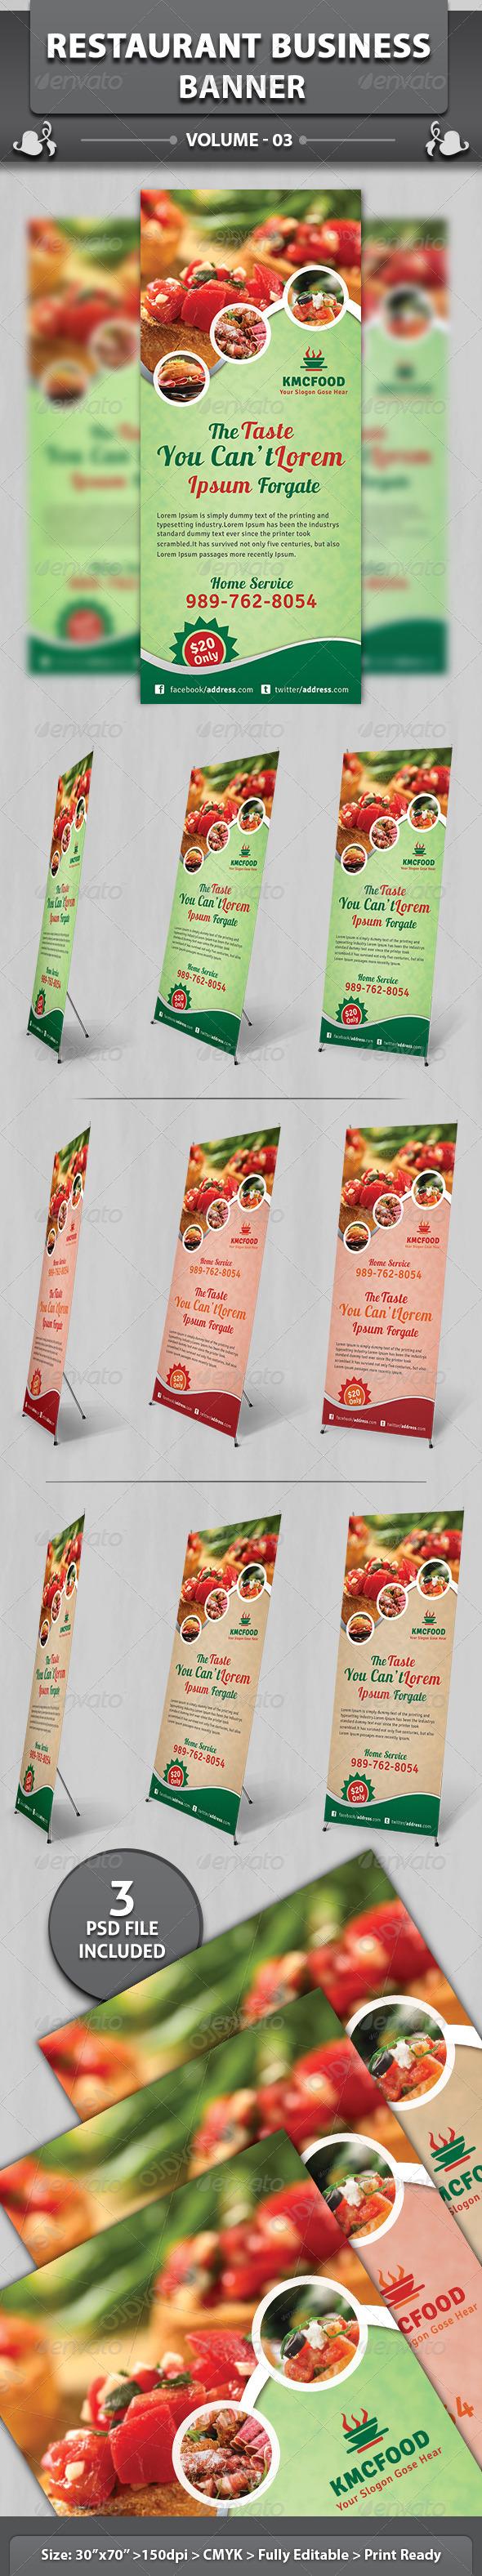 GraphicRiver Restaurant Business Banner v3 5094377